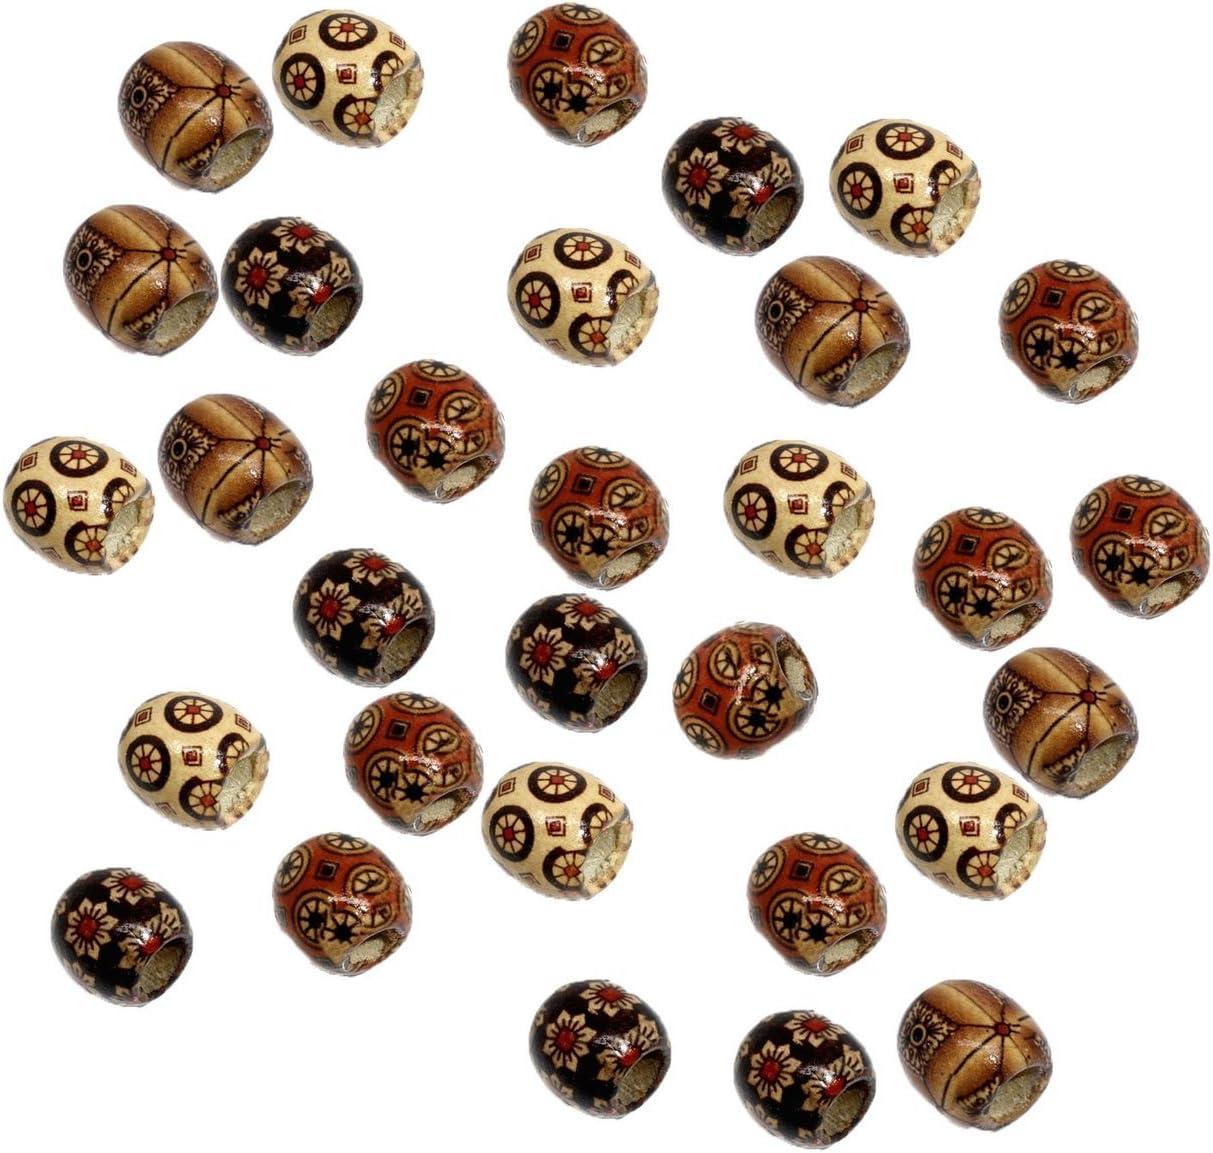 Set of 6 fabric beads barrel bead Fiber Bead macrame tube Red white and blue polka dot with some swish Wide hole dread sleeve